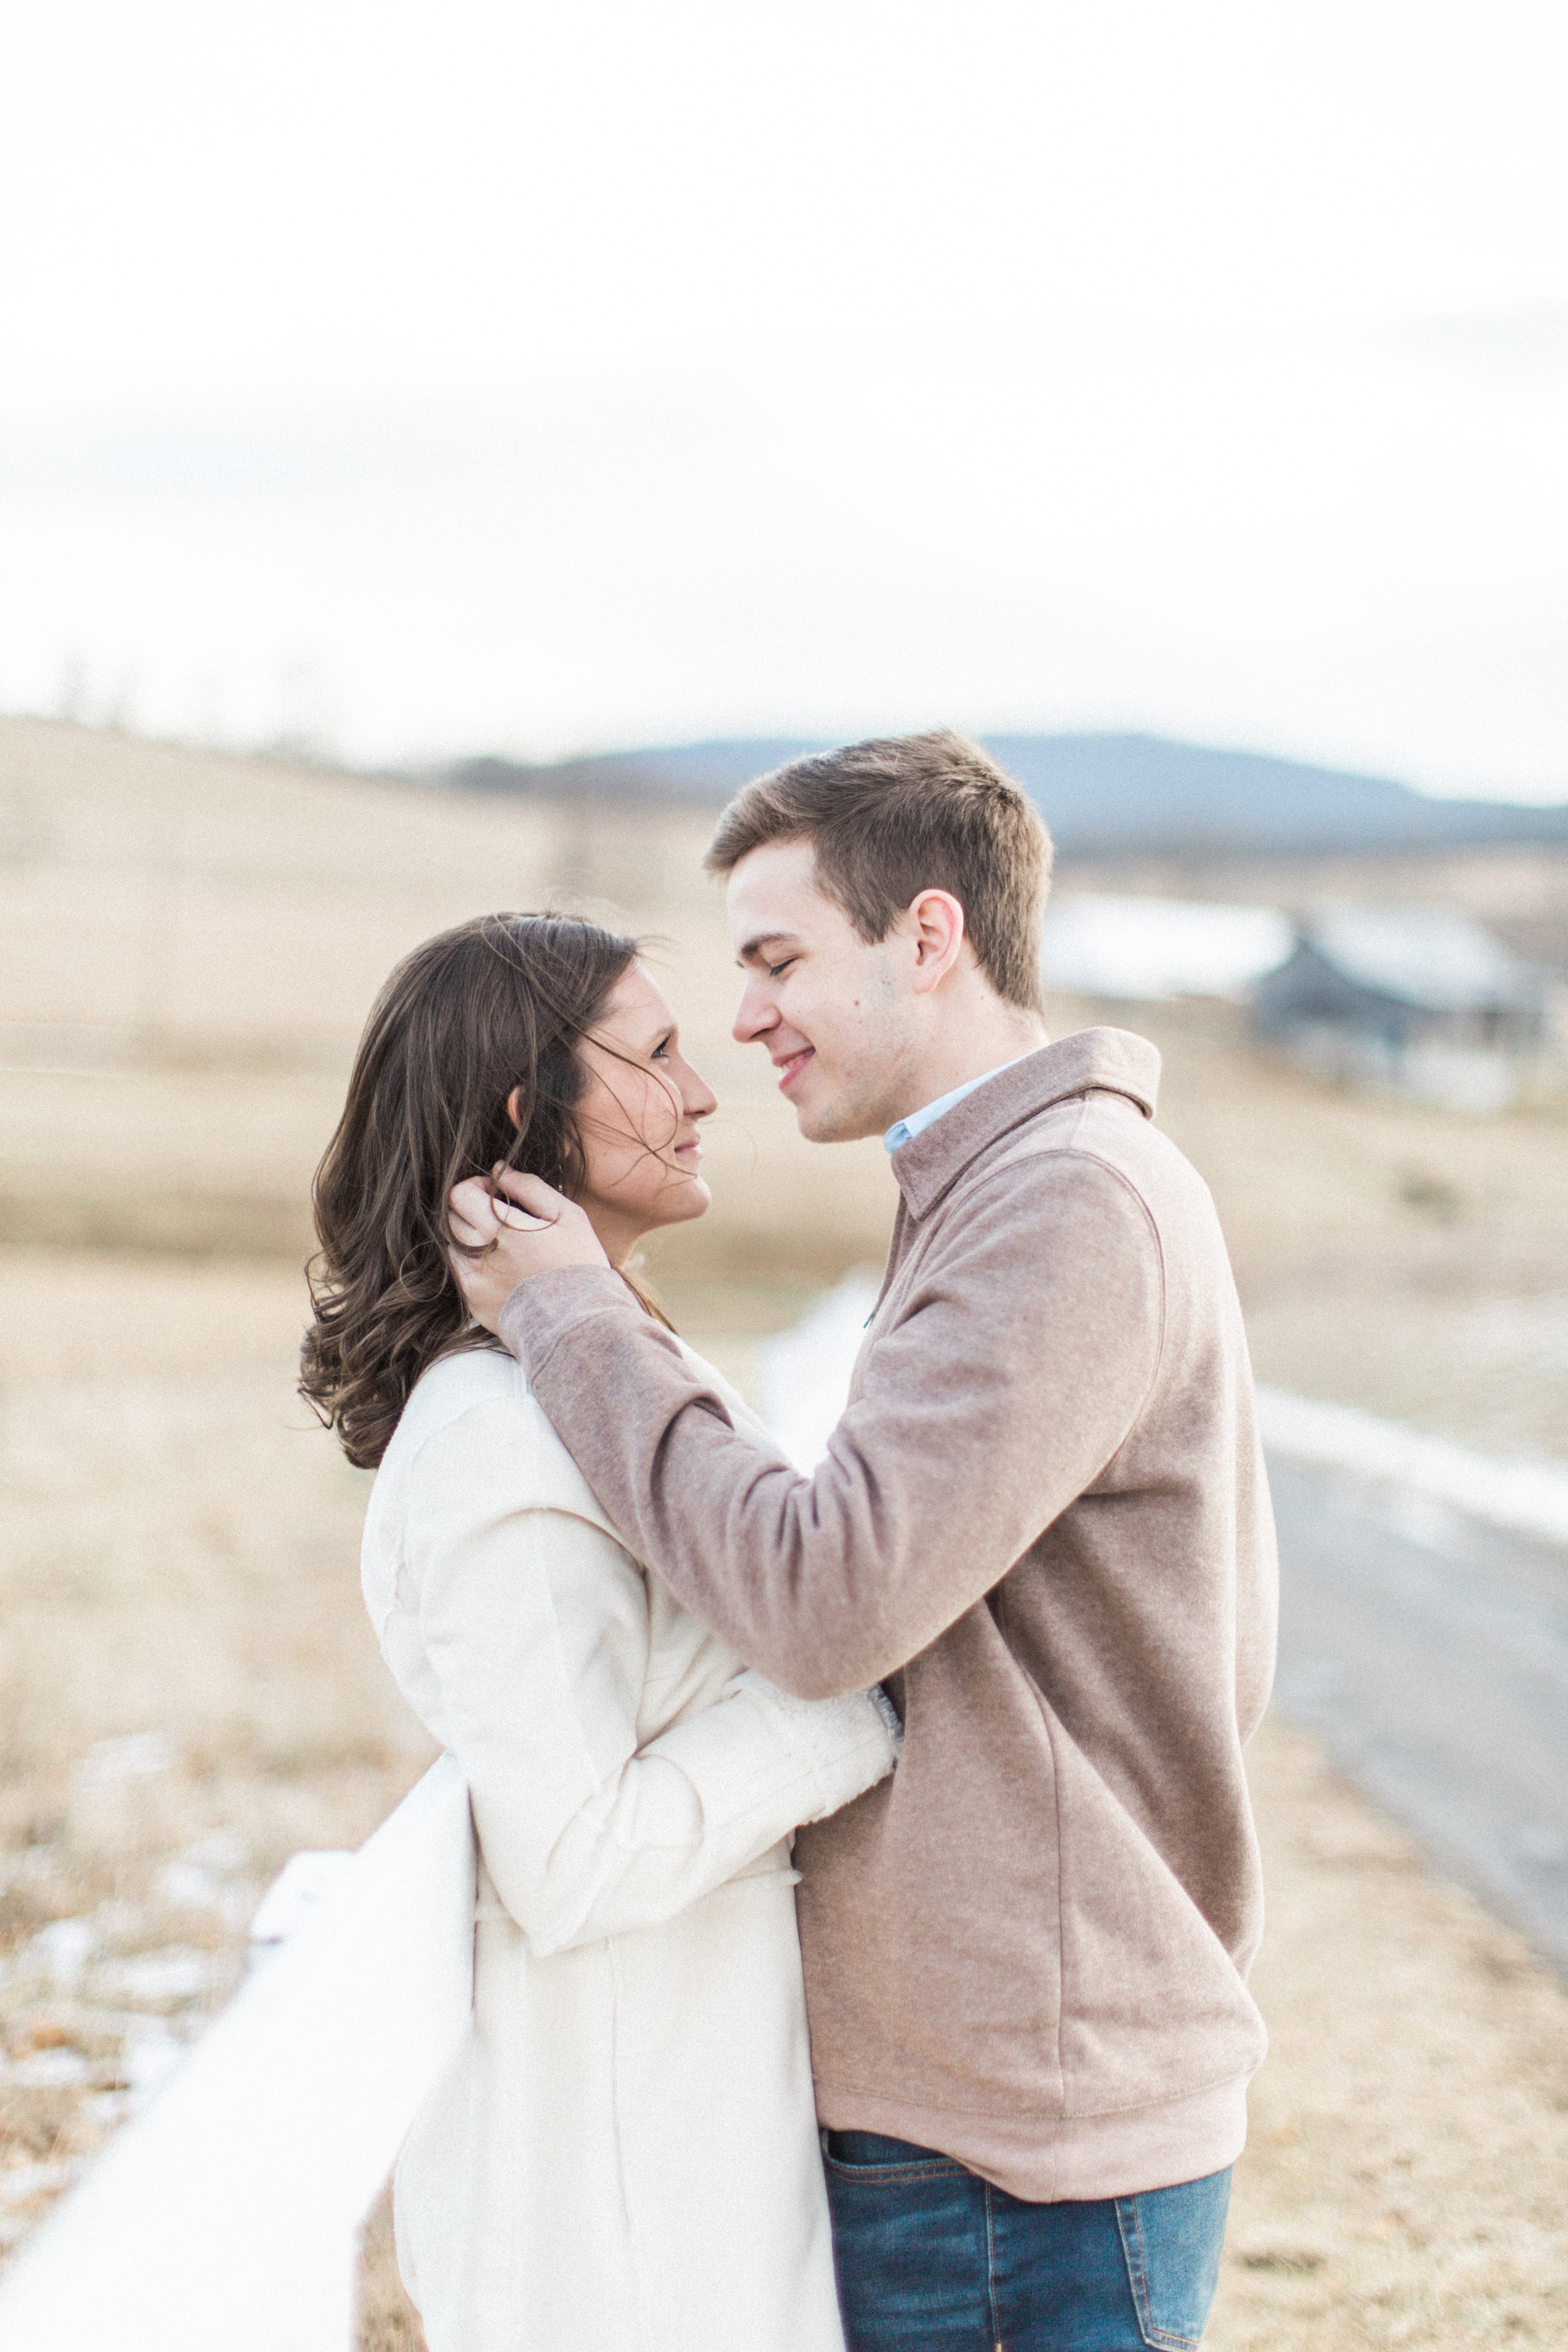 Abigail_Jill_Photography_Maryland_Engagement_Farm_Emily_Justin151.jpg